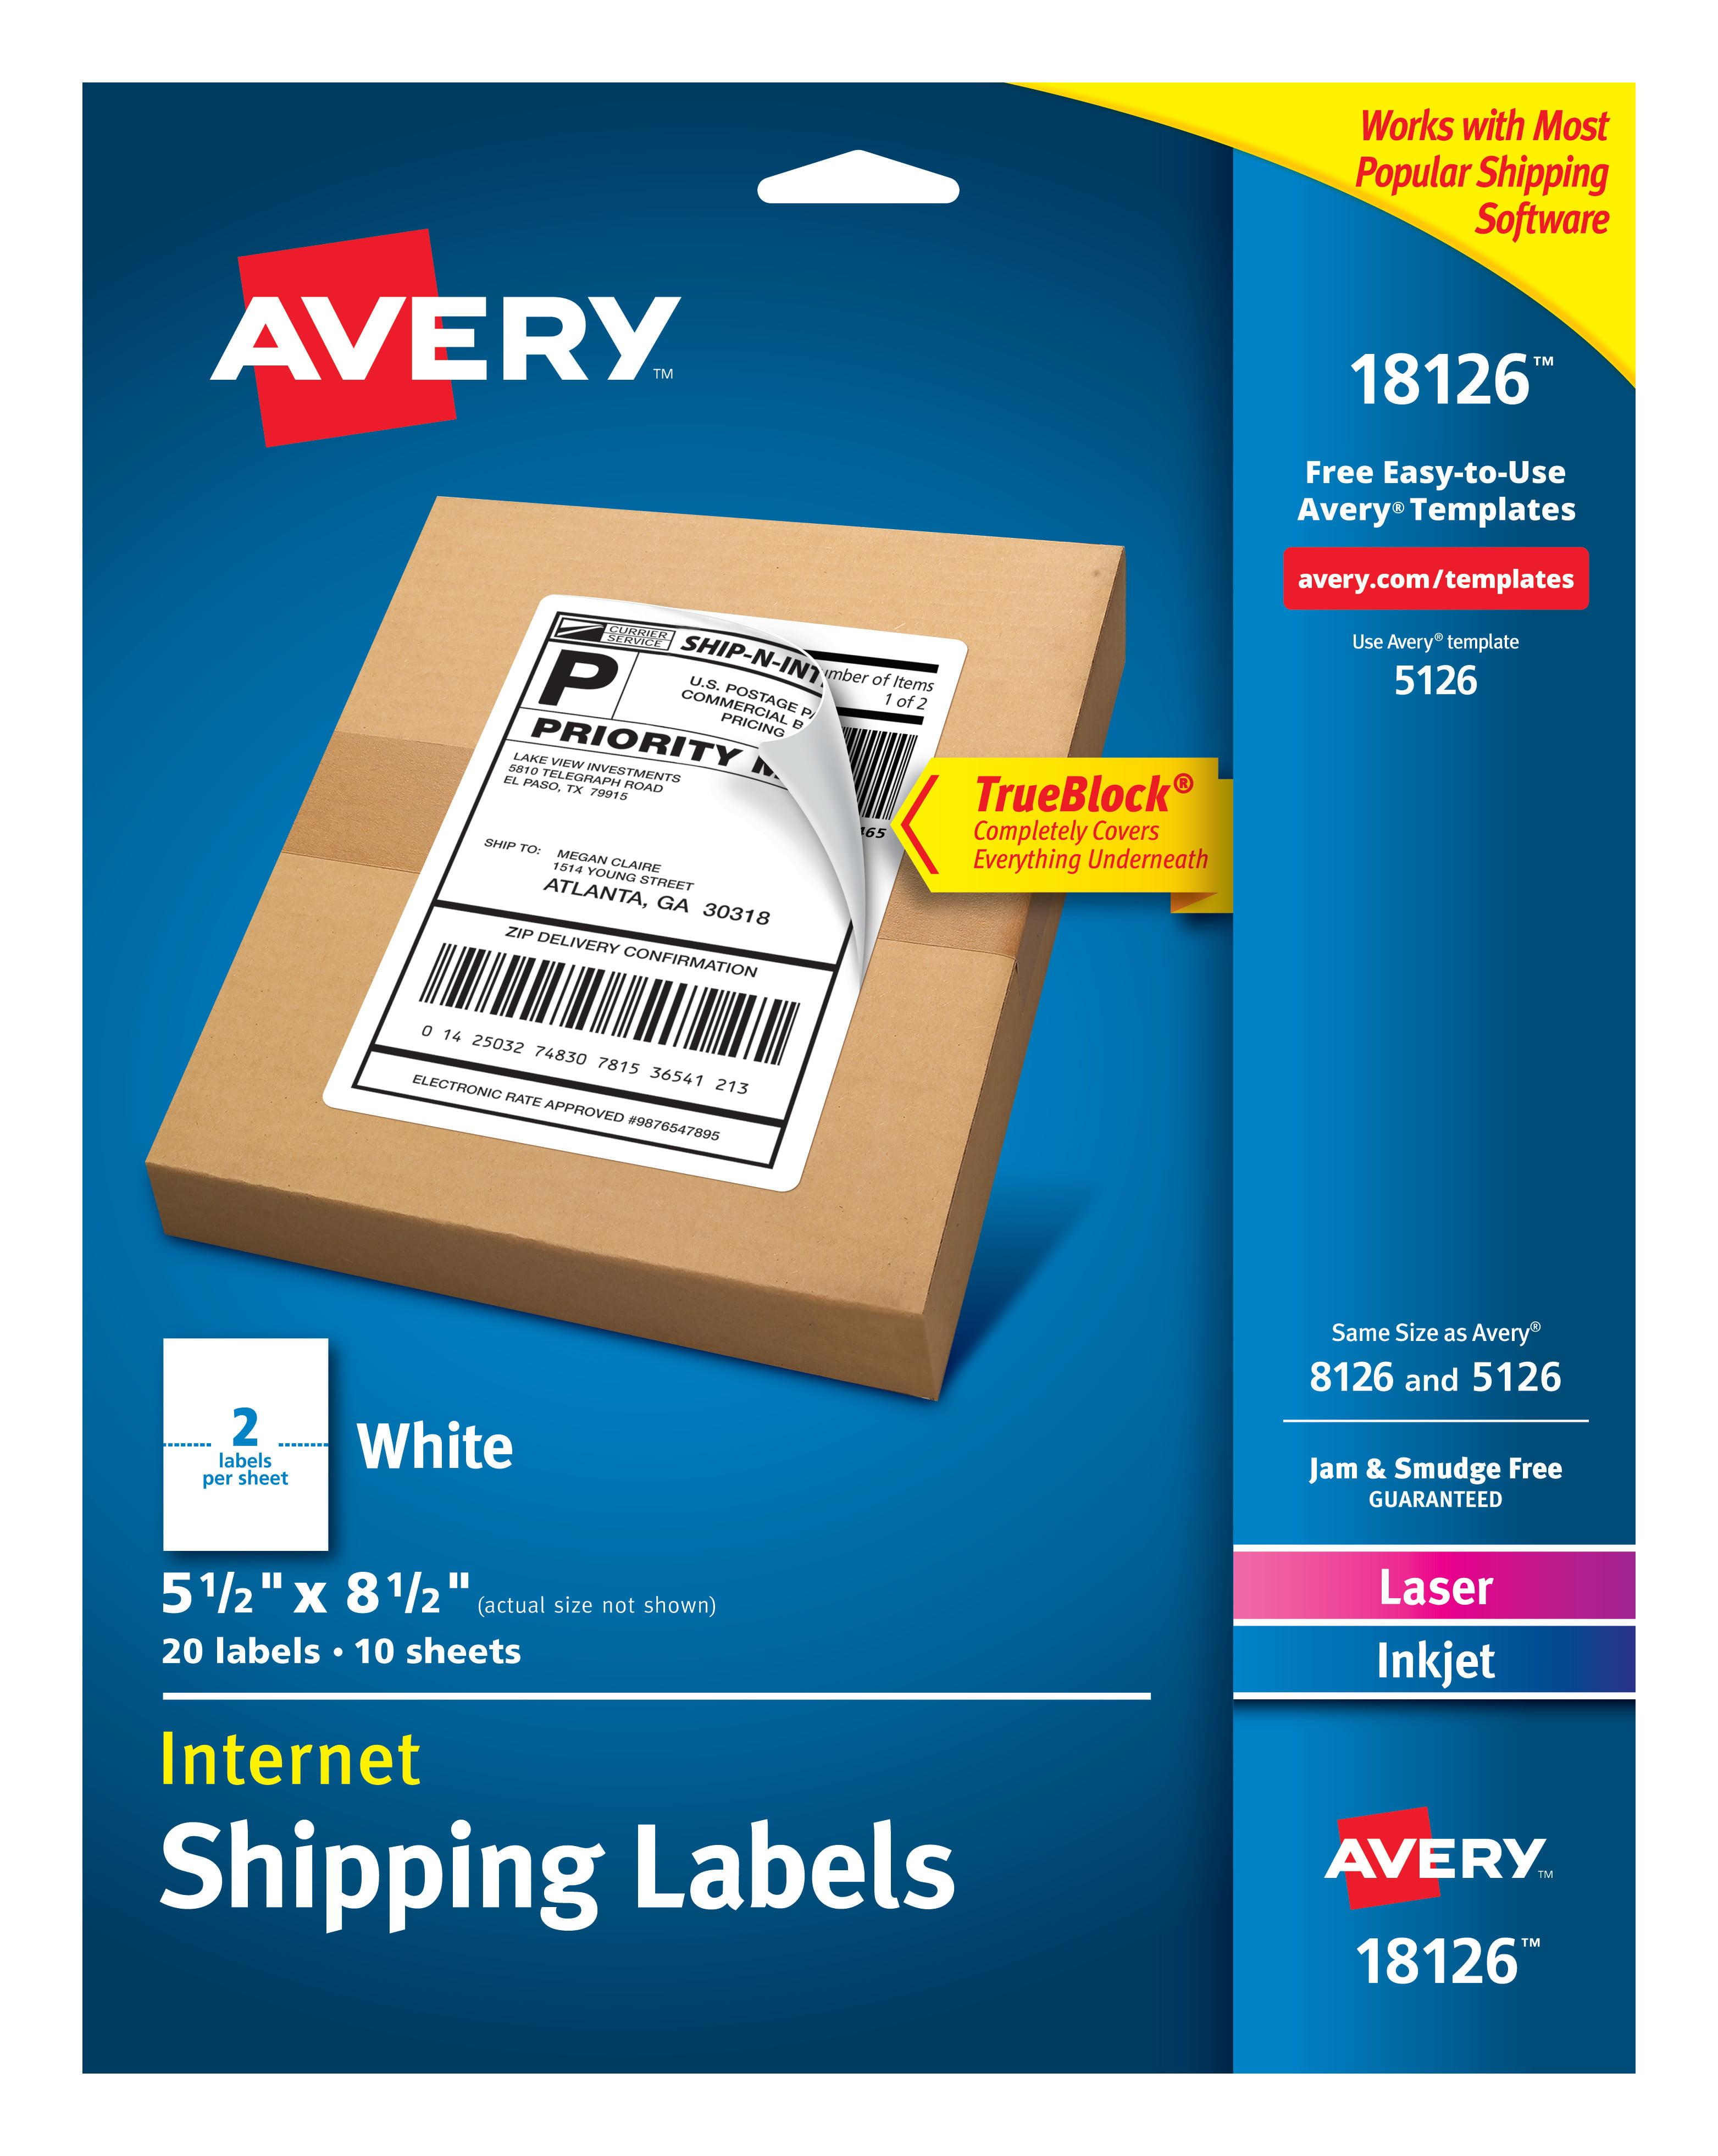 avery internet shipping labels trueblock technology permanent